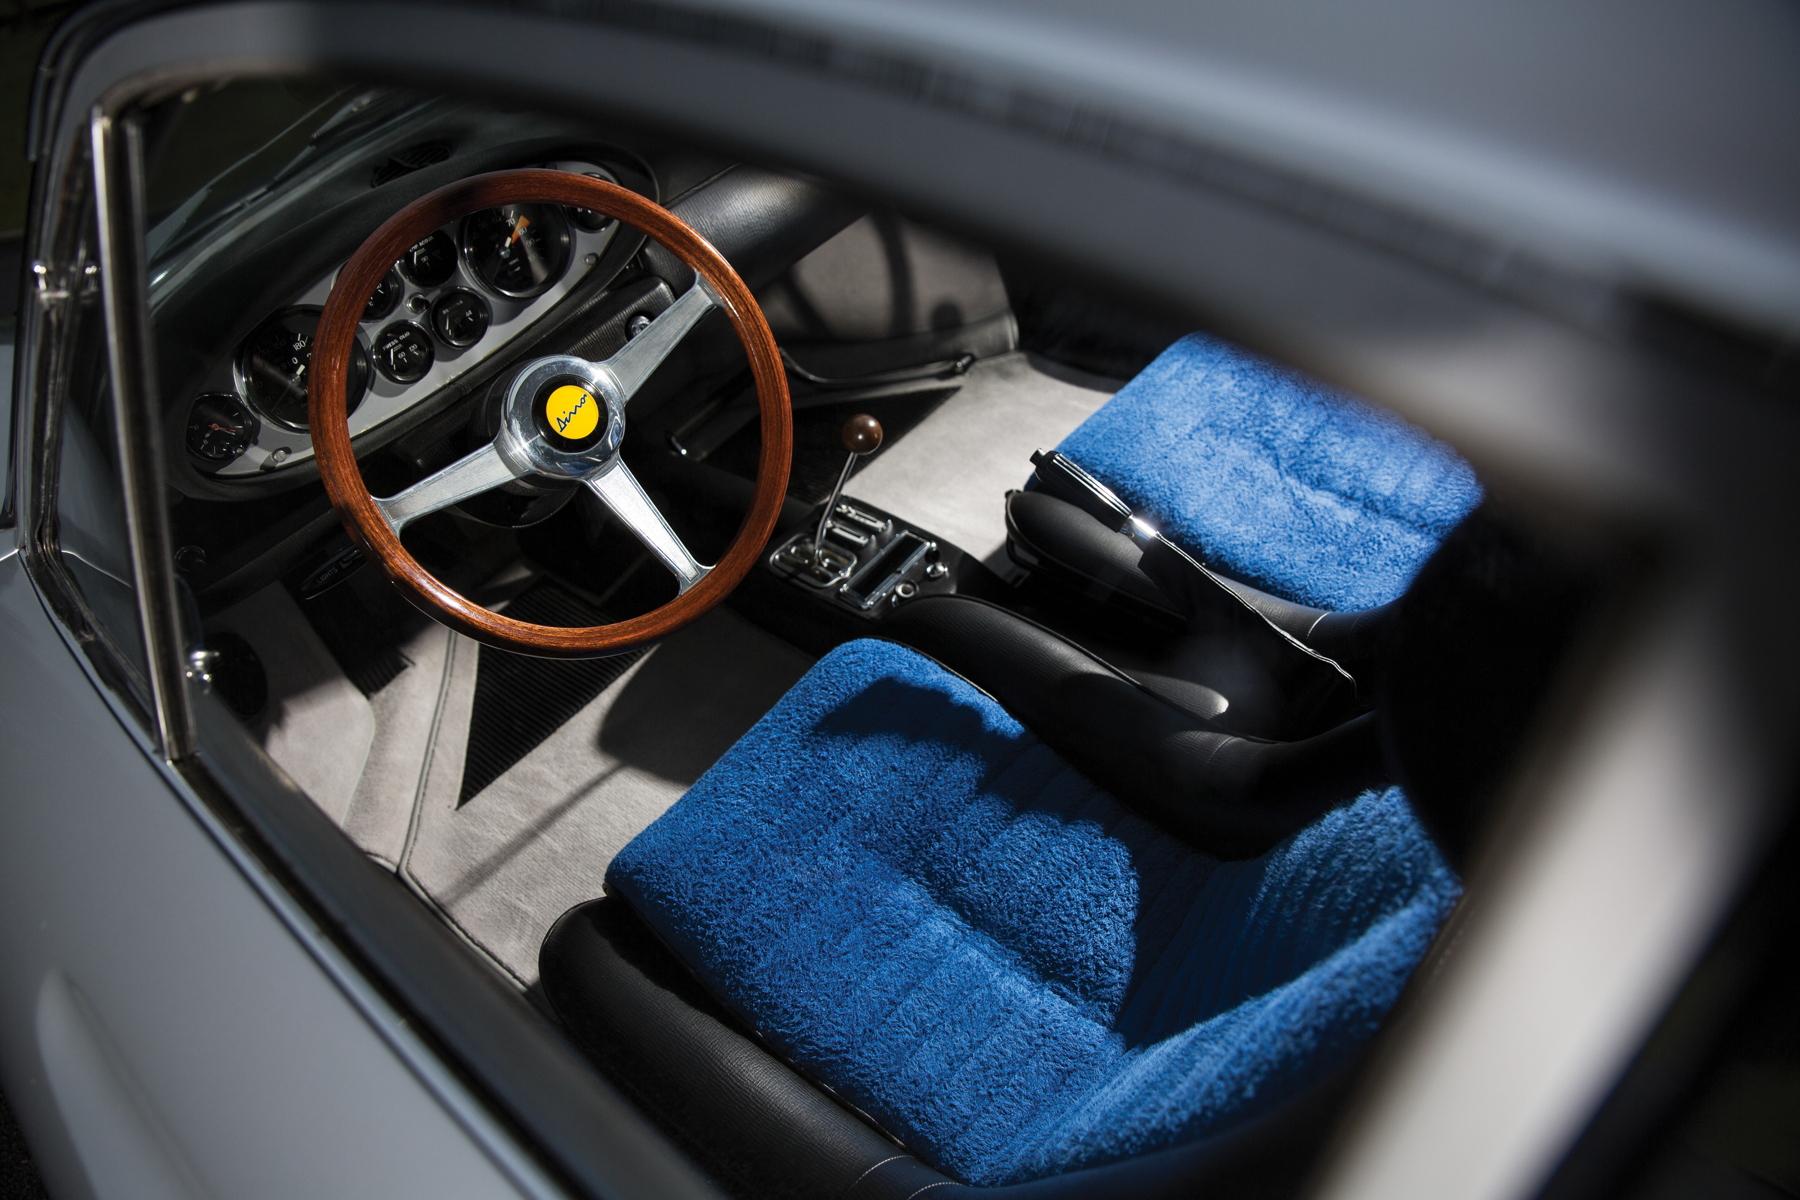 RM Sotheby's Retromobile - Ferrari Dino 206 GT cockpit